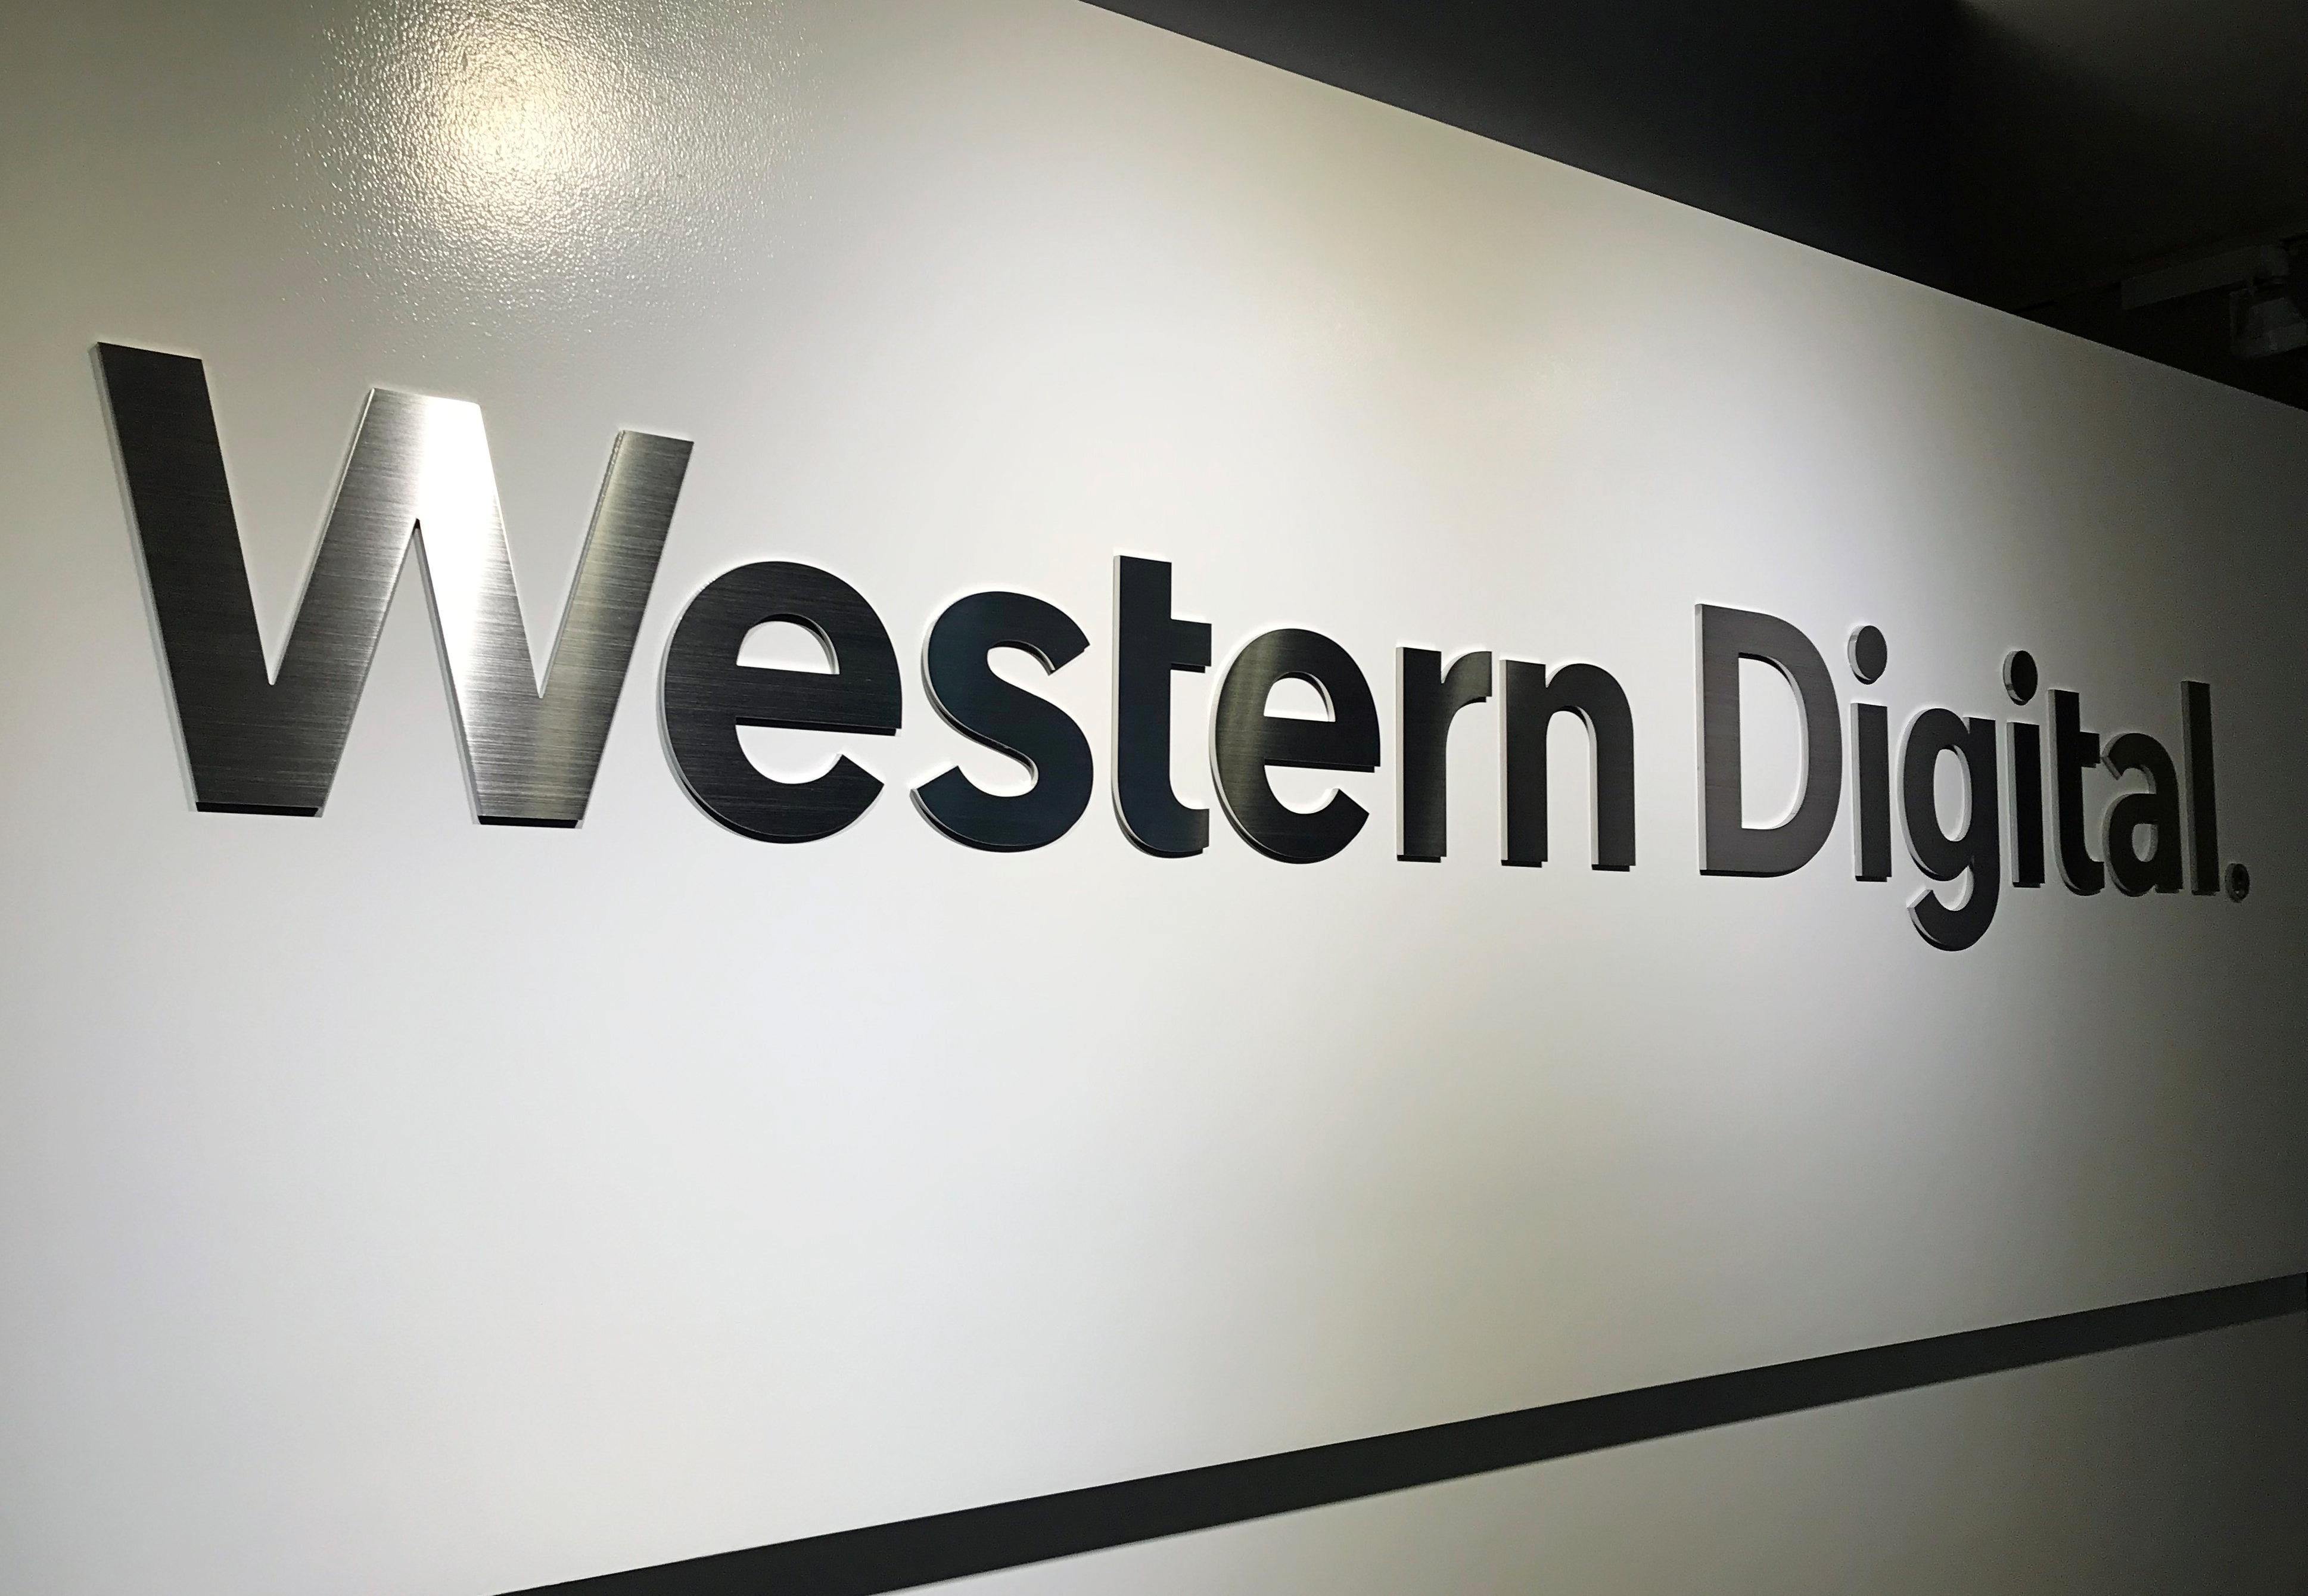 The logo of Western Digital Corporation is displayed at the company's headquarters in Tokyo, Japan, May 27, 2019. REUTERS/Yoshiyasu Shida